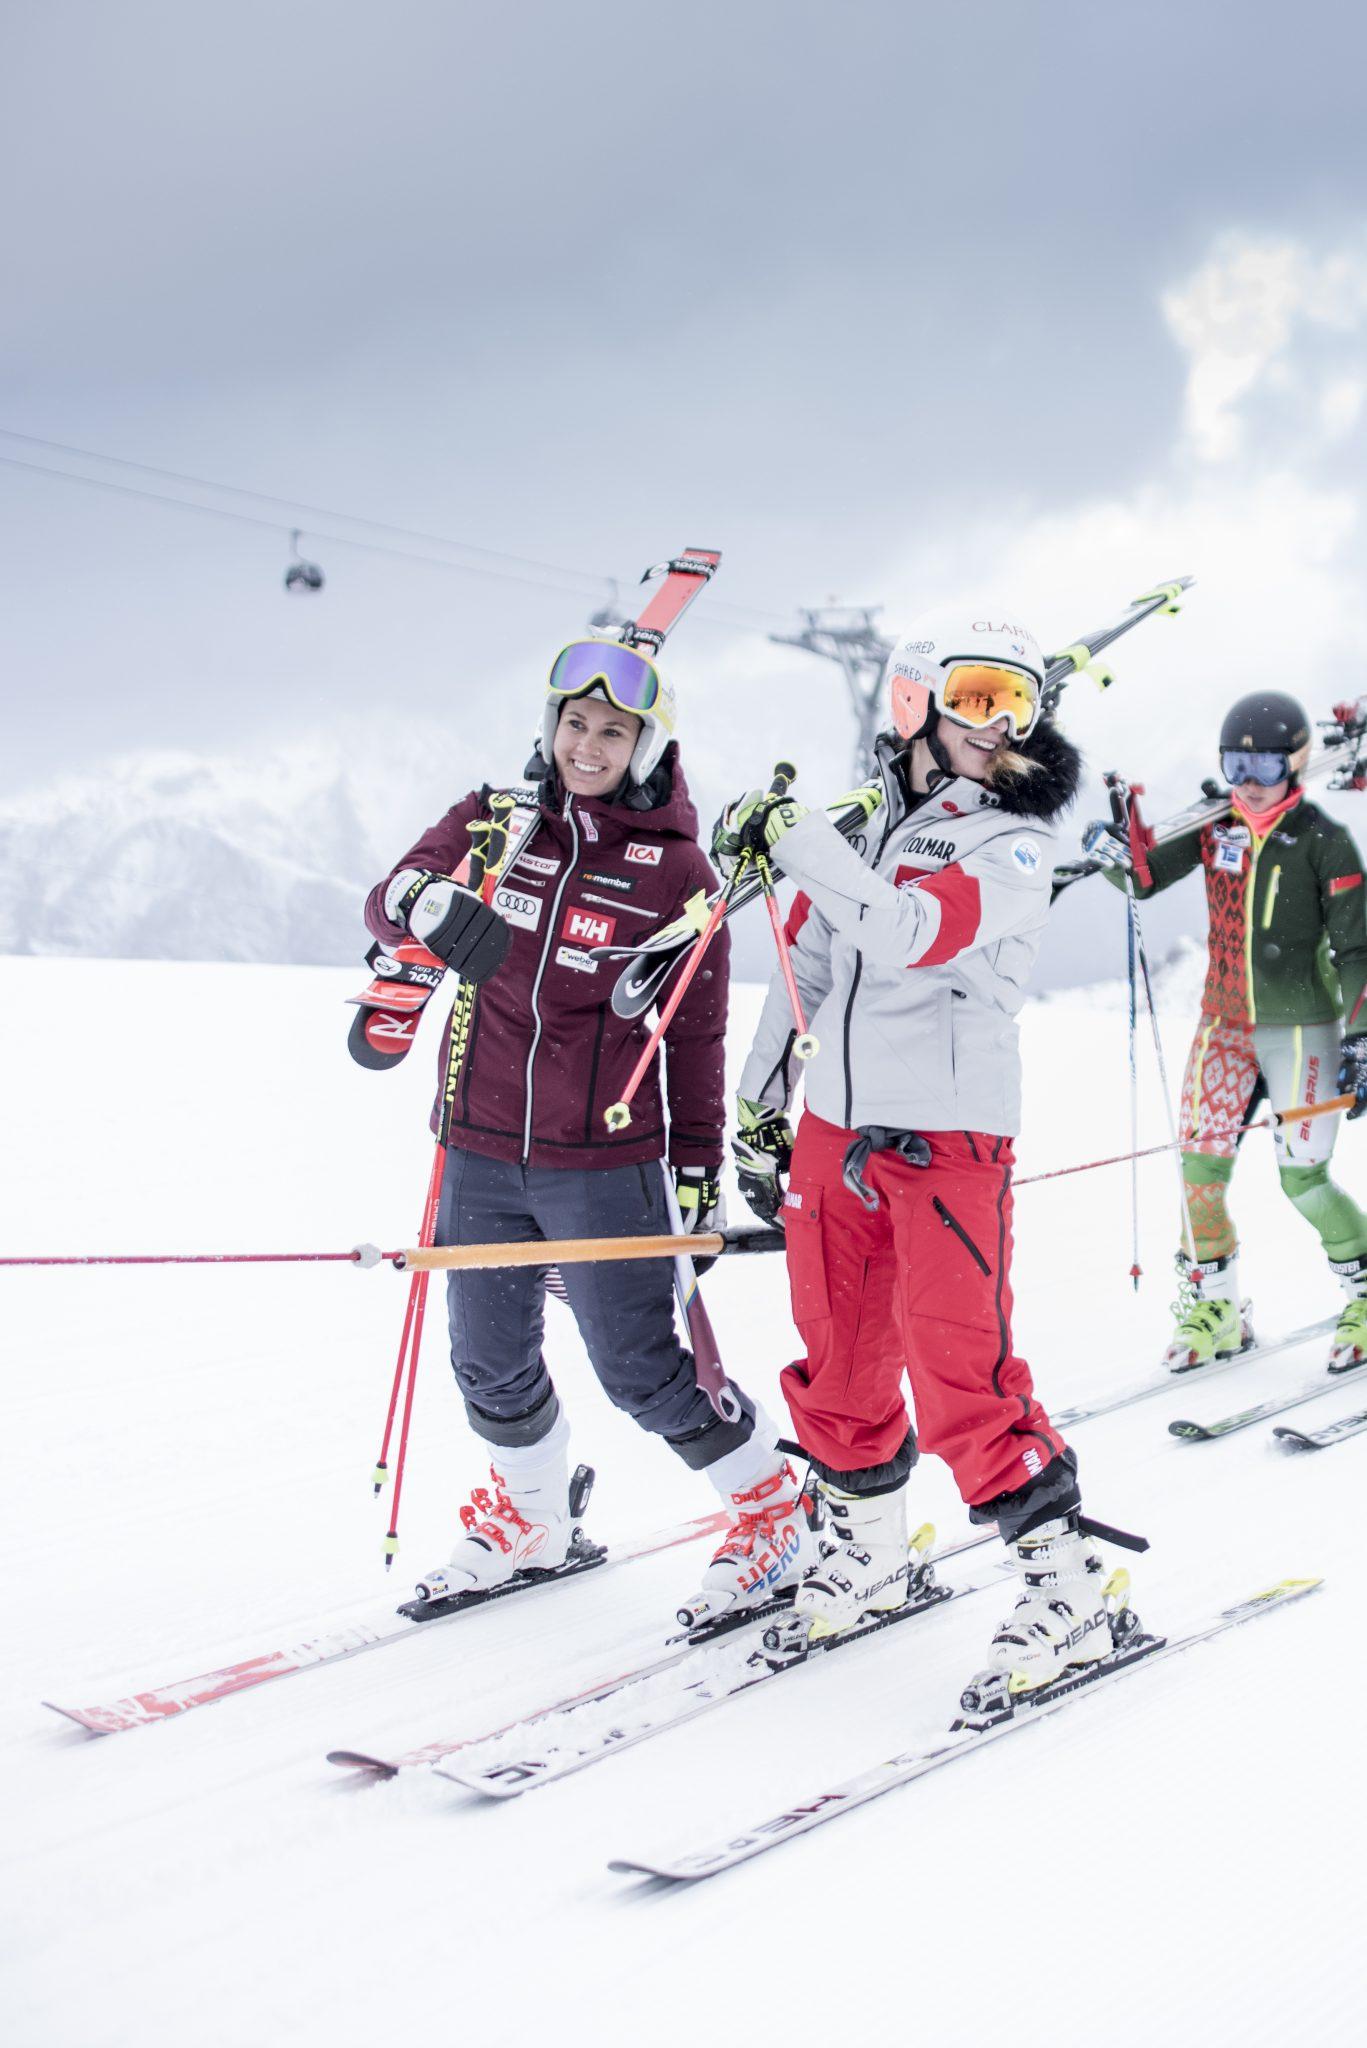 femme-skieuse-montagne-competition-coupe-du-monde-solden-2018